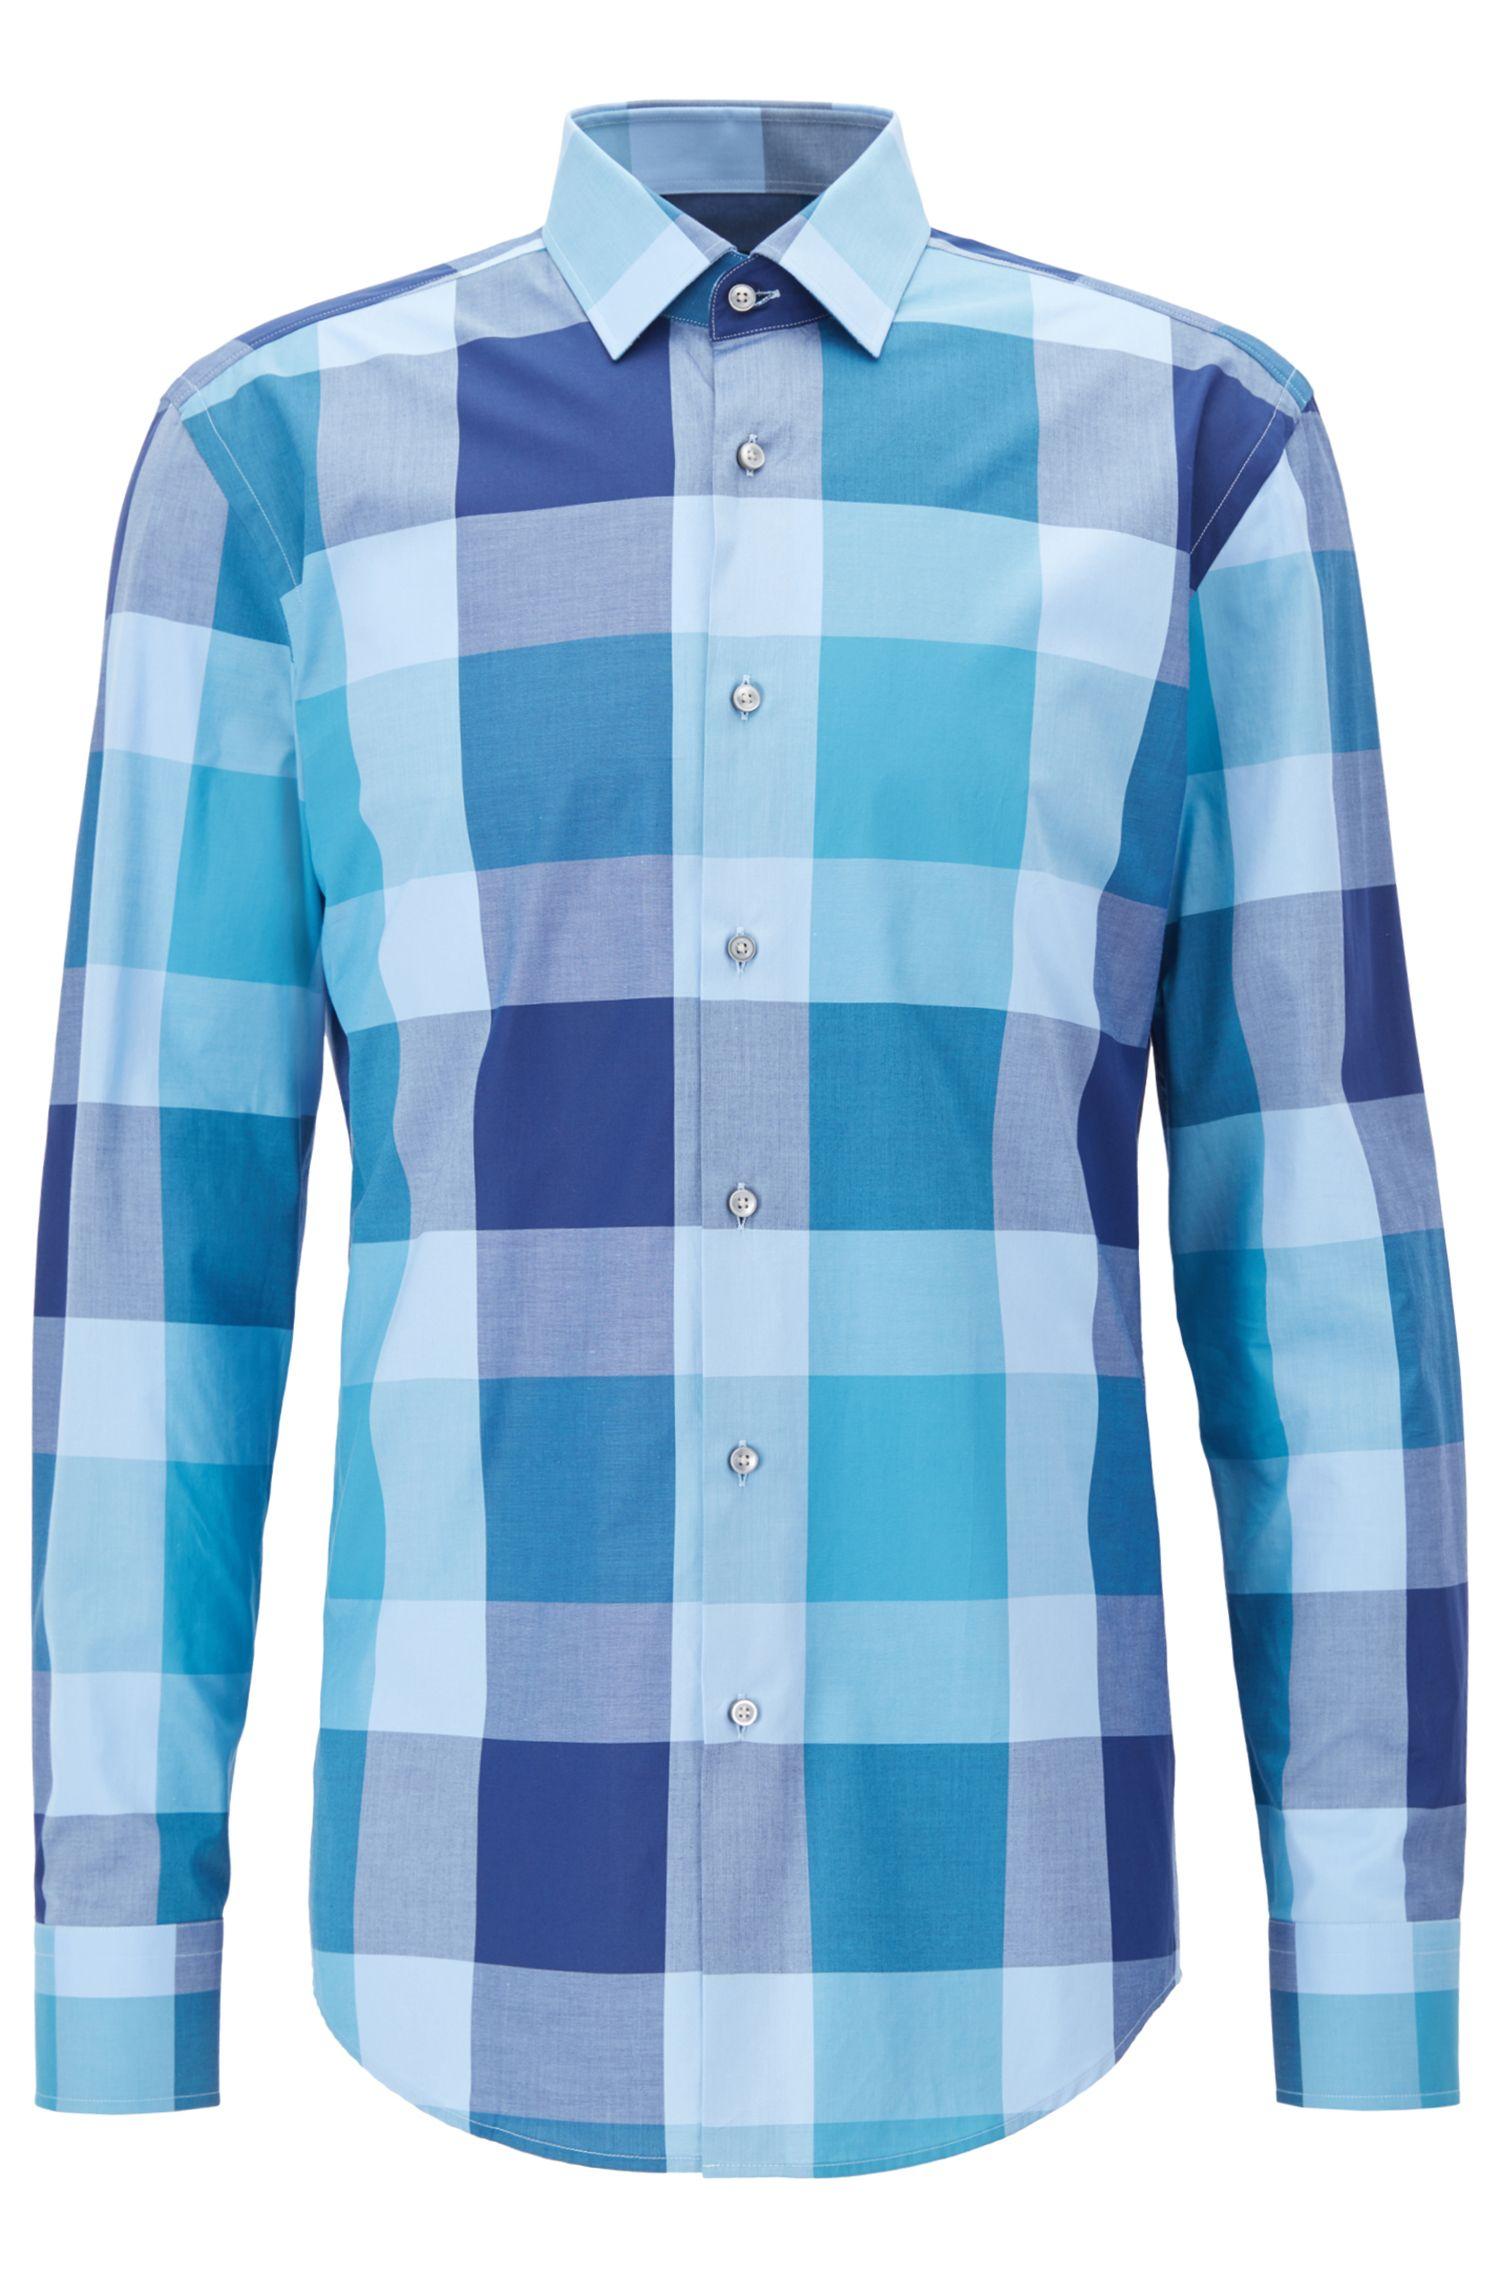 Oversize Check Cotton Dress Shirt, Slim Fit | Jenno